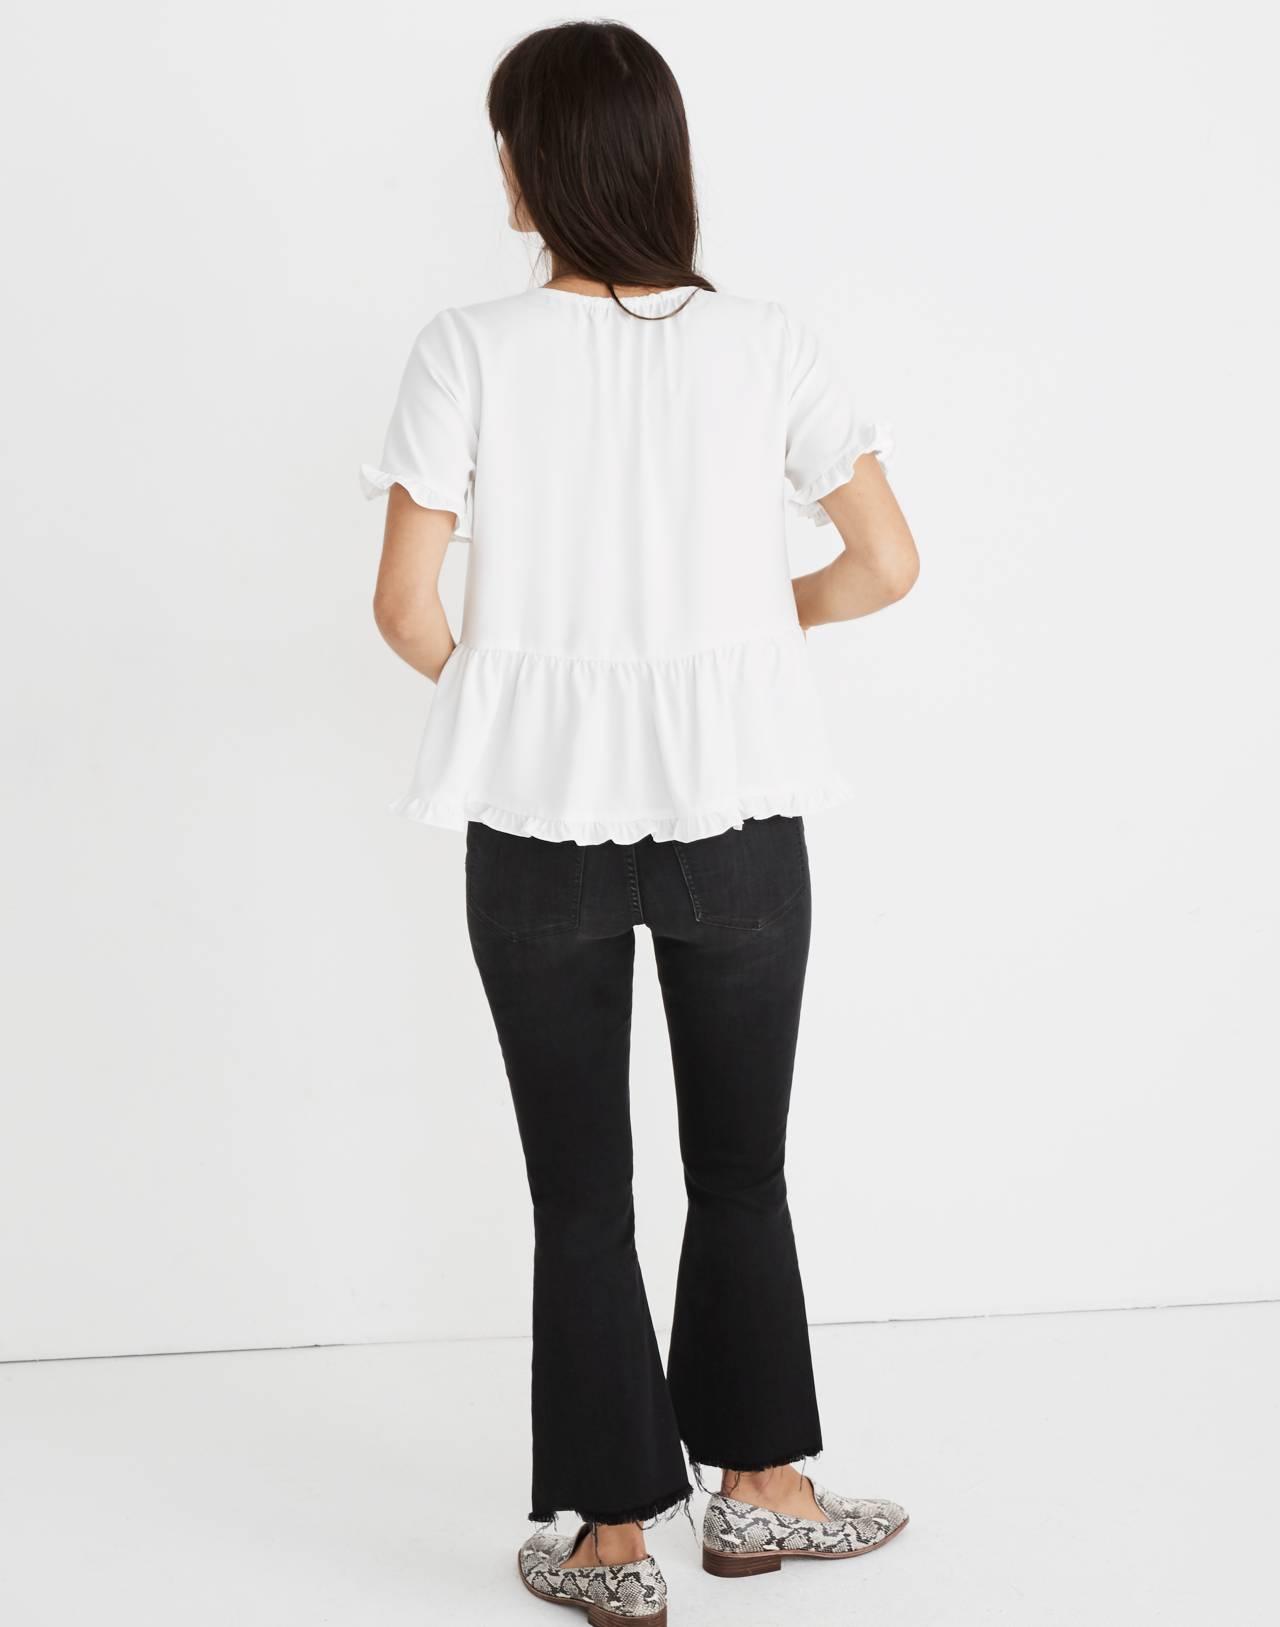 Stanza Ruffle-Hem Top in white nappa image 2